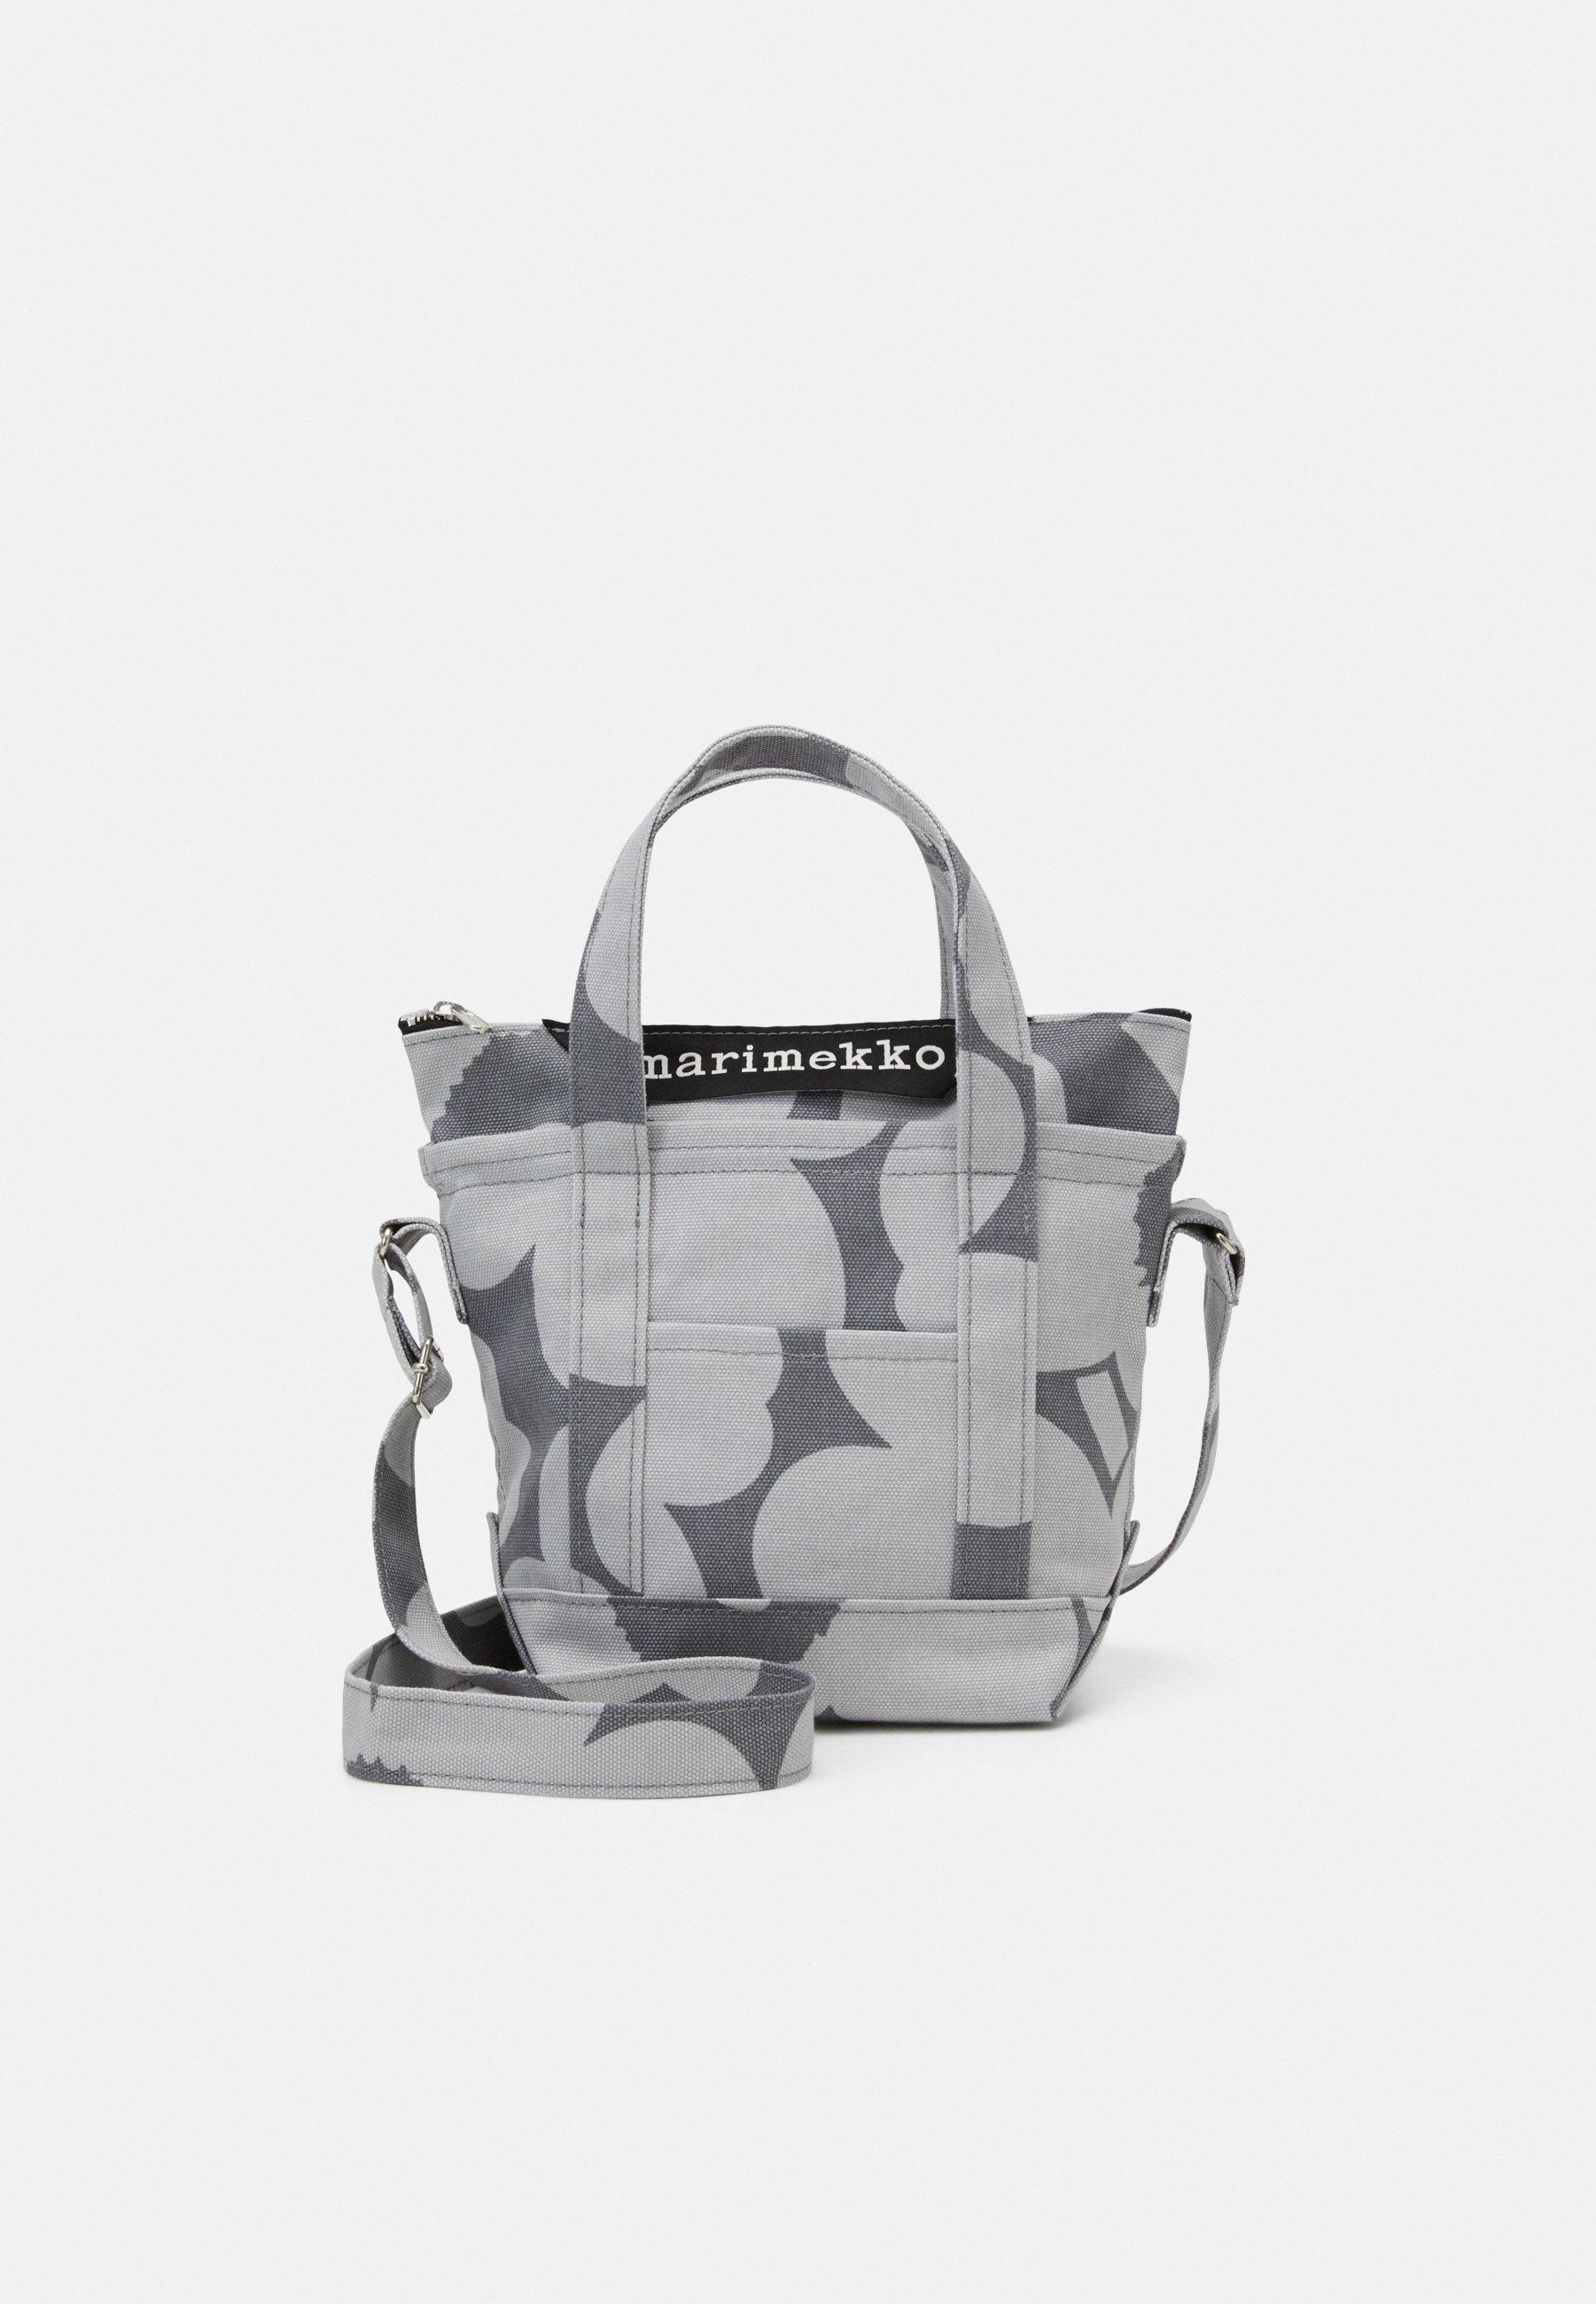 MILLI MATKURI PIENI UNIKKO BAG Handväska greylight grey